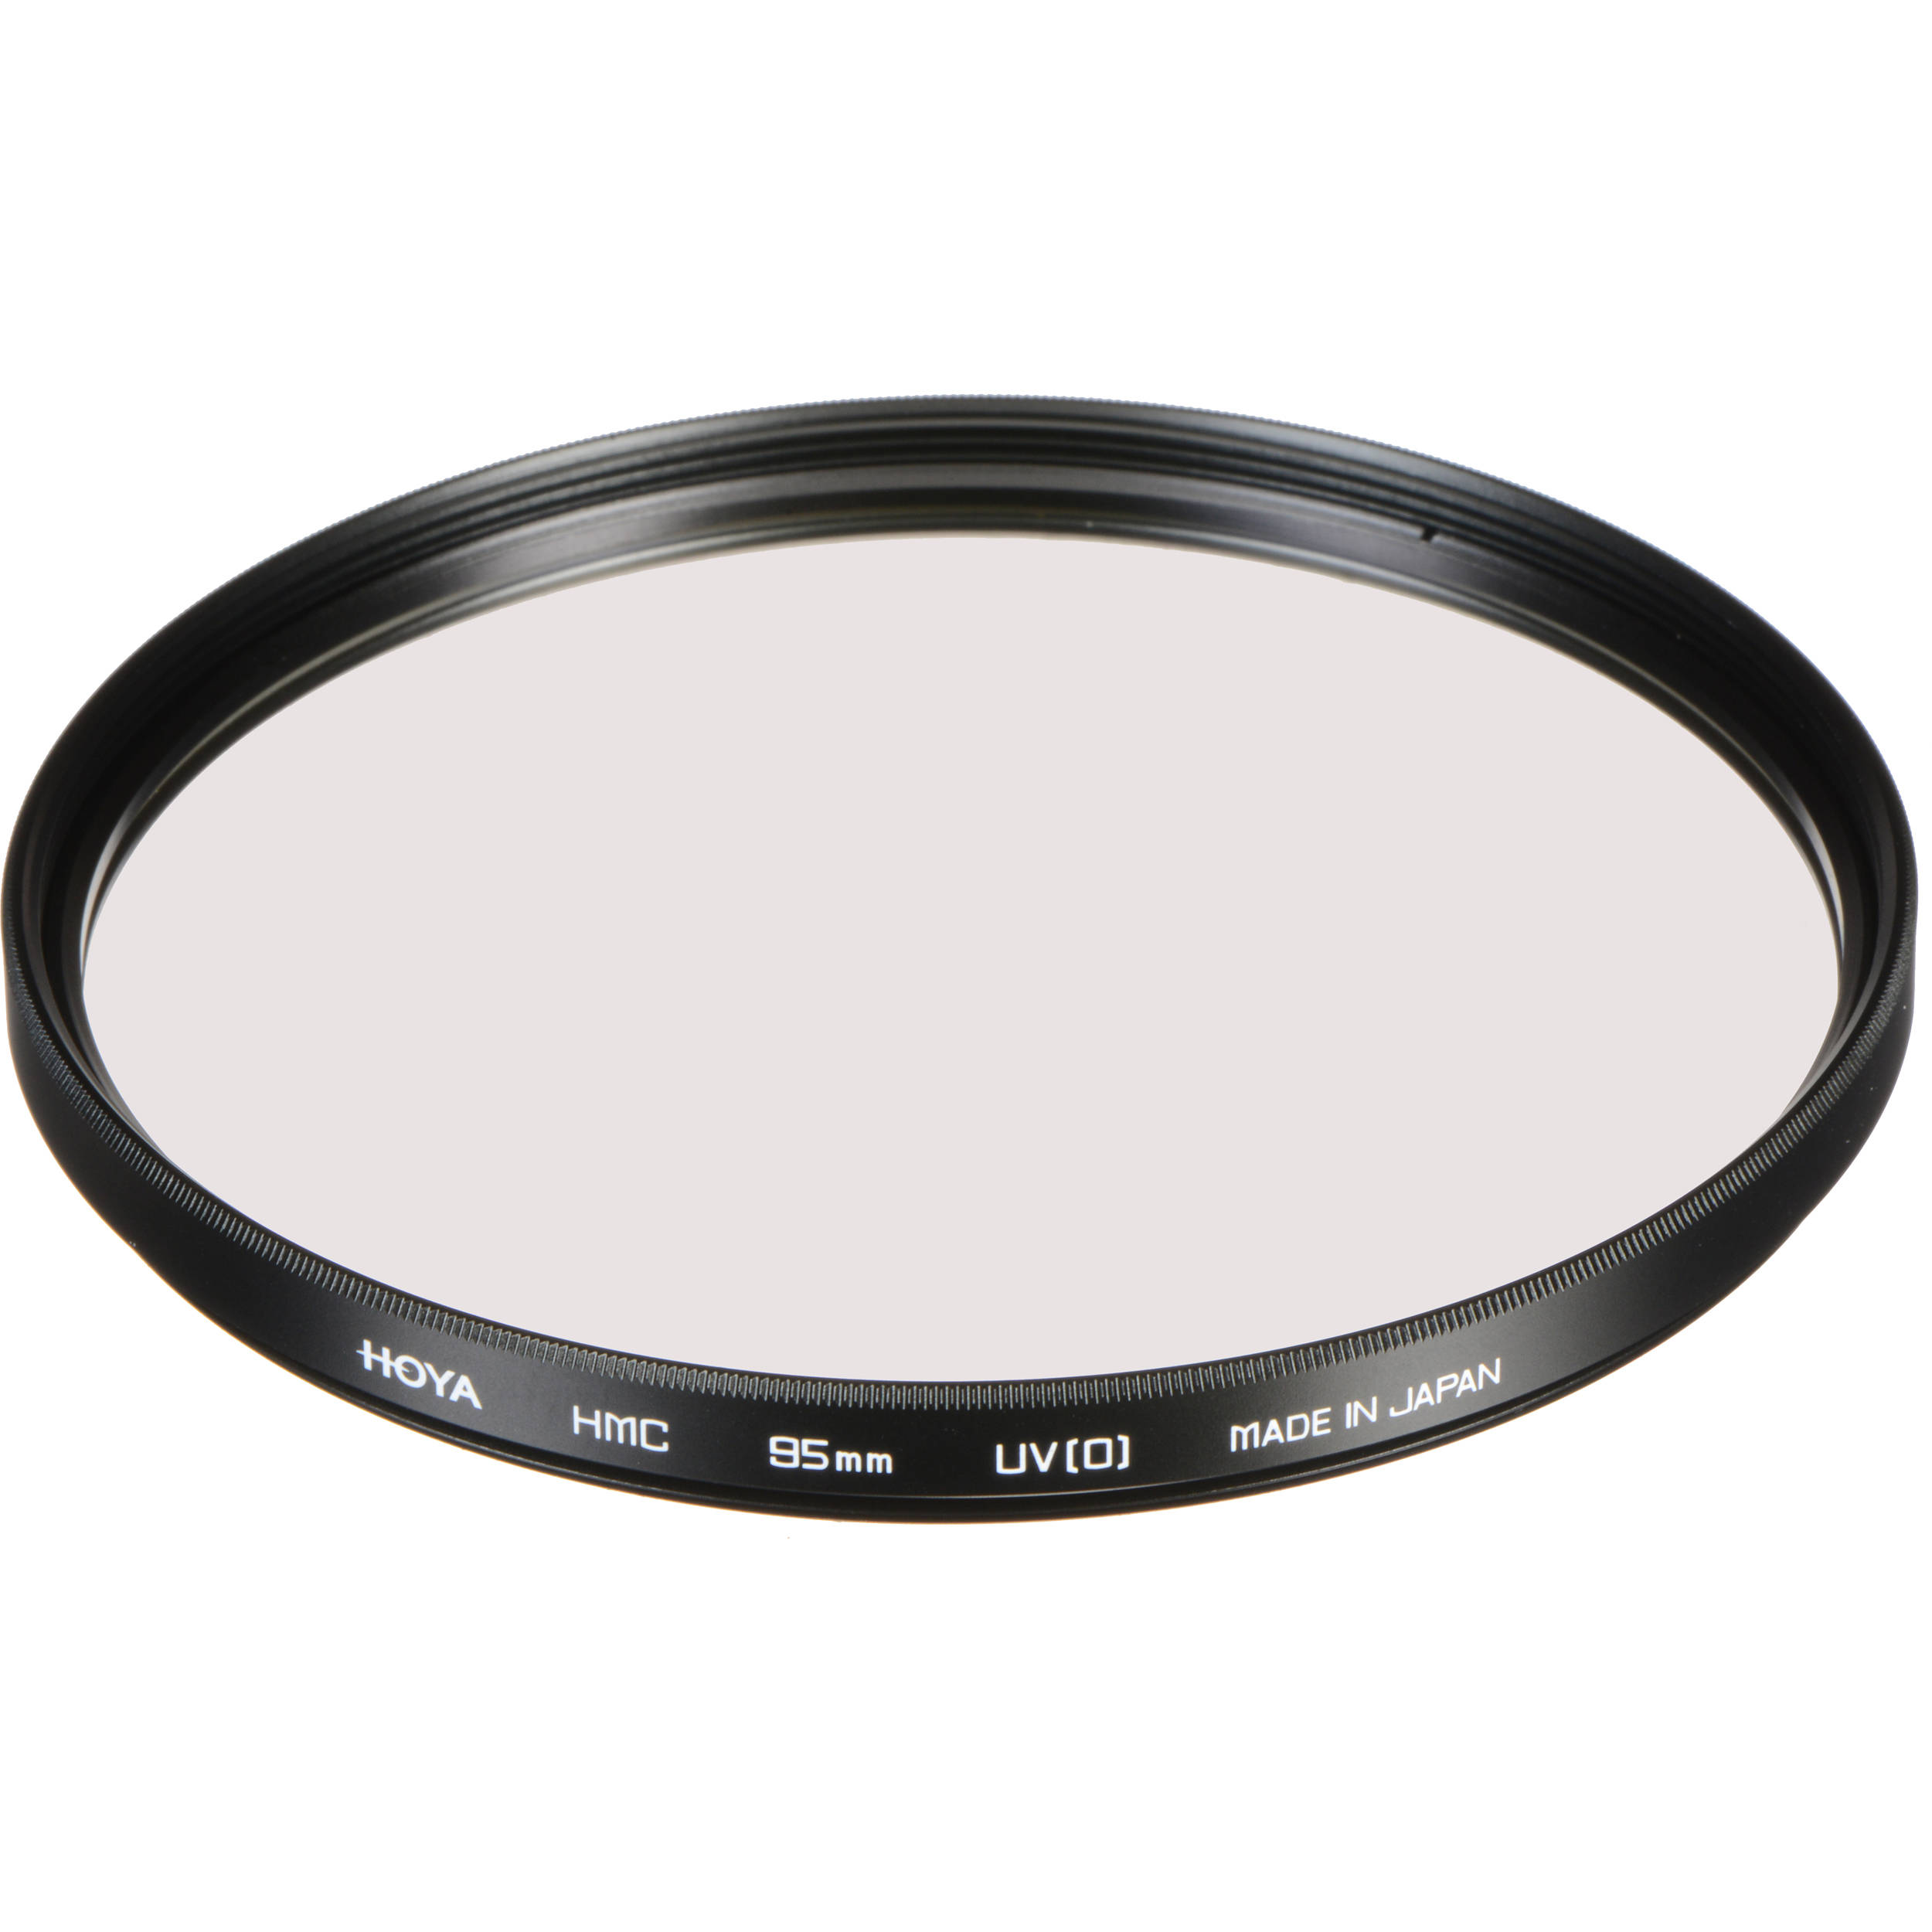 Hoya Uv Filters Bh Photo Video Pro 1 Digital Filter 58mm 95mm Hmc